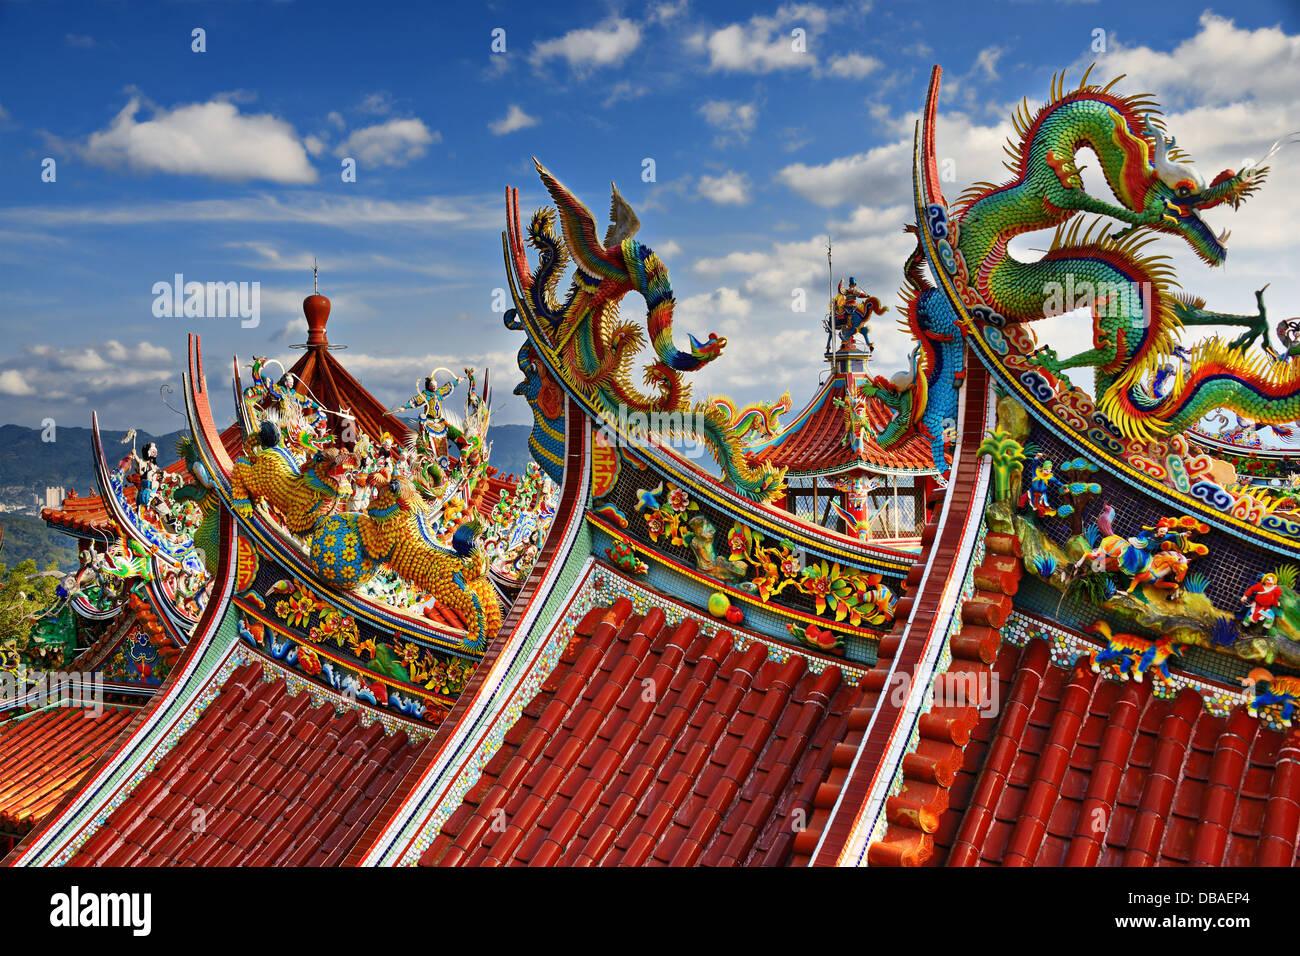 Kunstvolle chinesische Tempel in Bishan-Tempel in Taipei, Taiwan. Stockbild